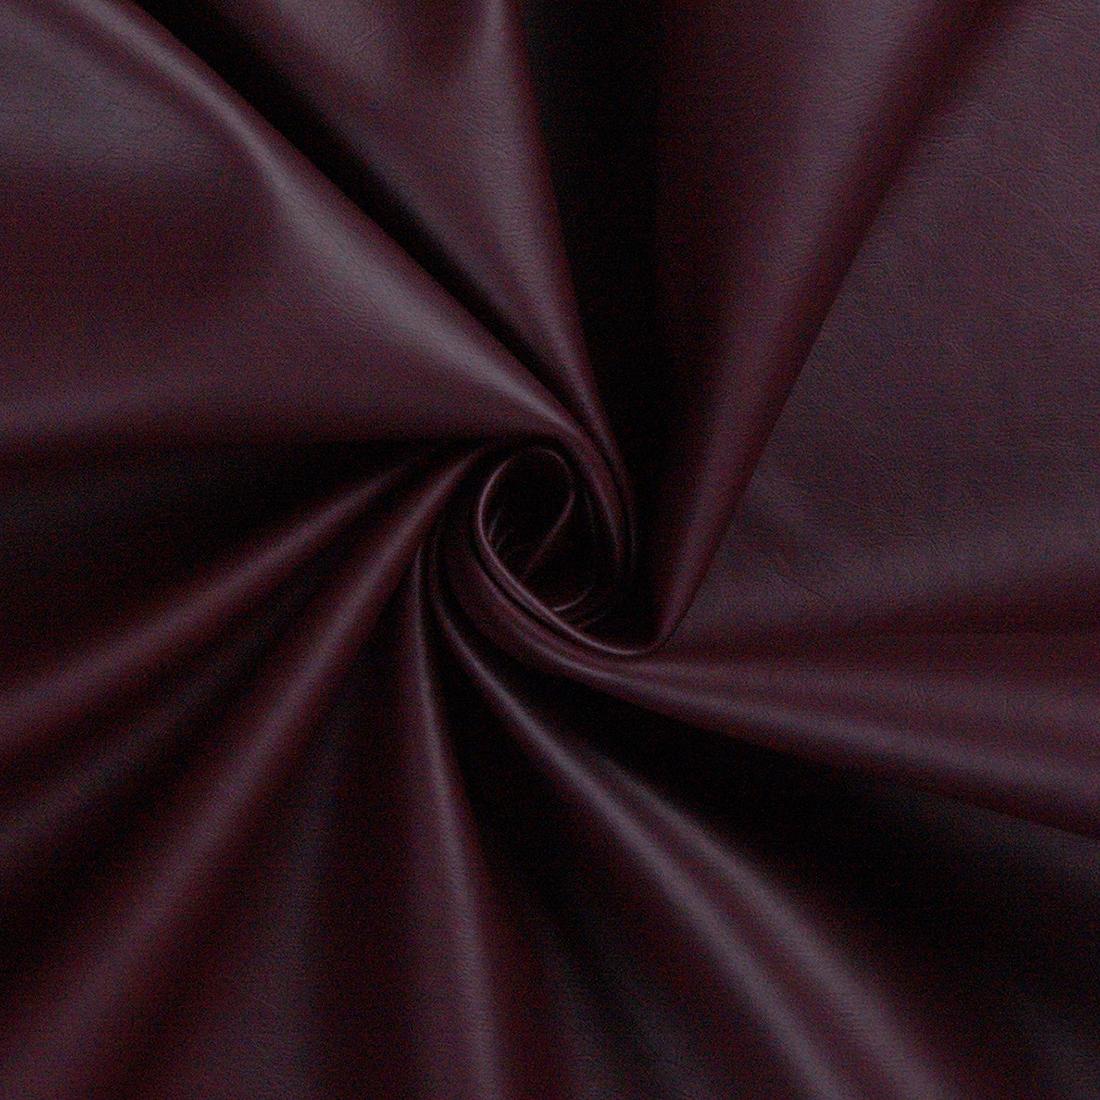 Leatherlook Wine Dress Fabric